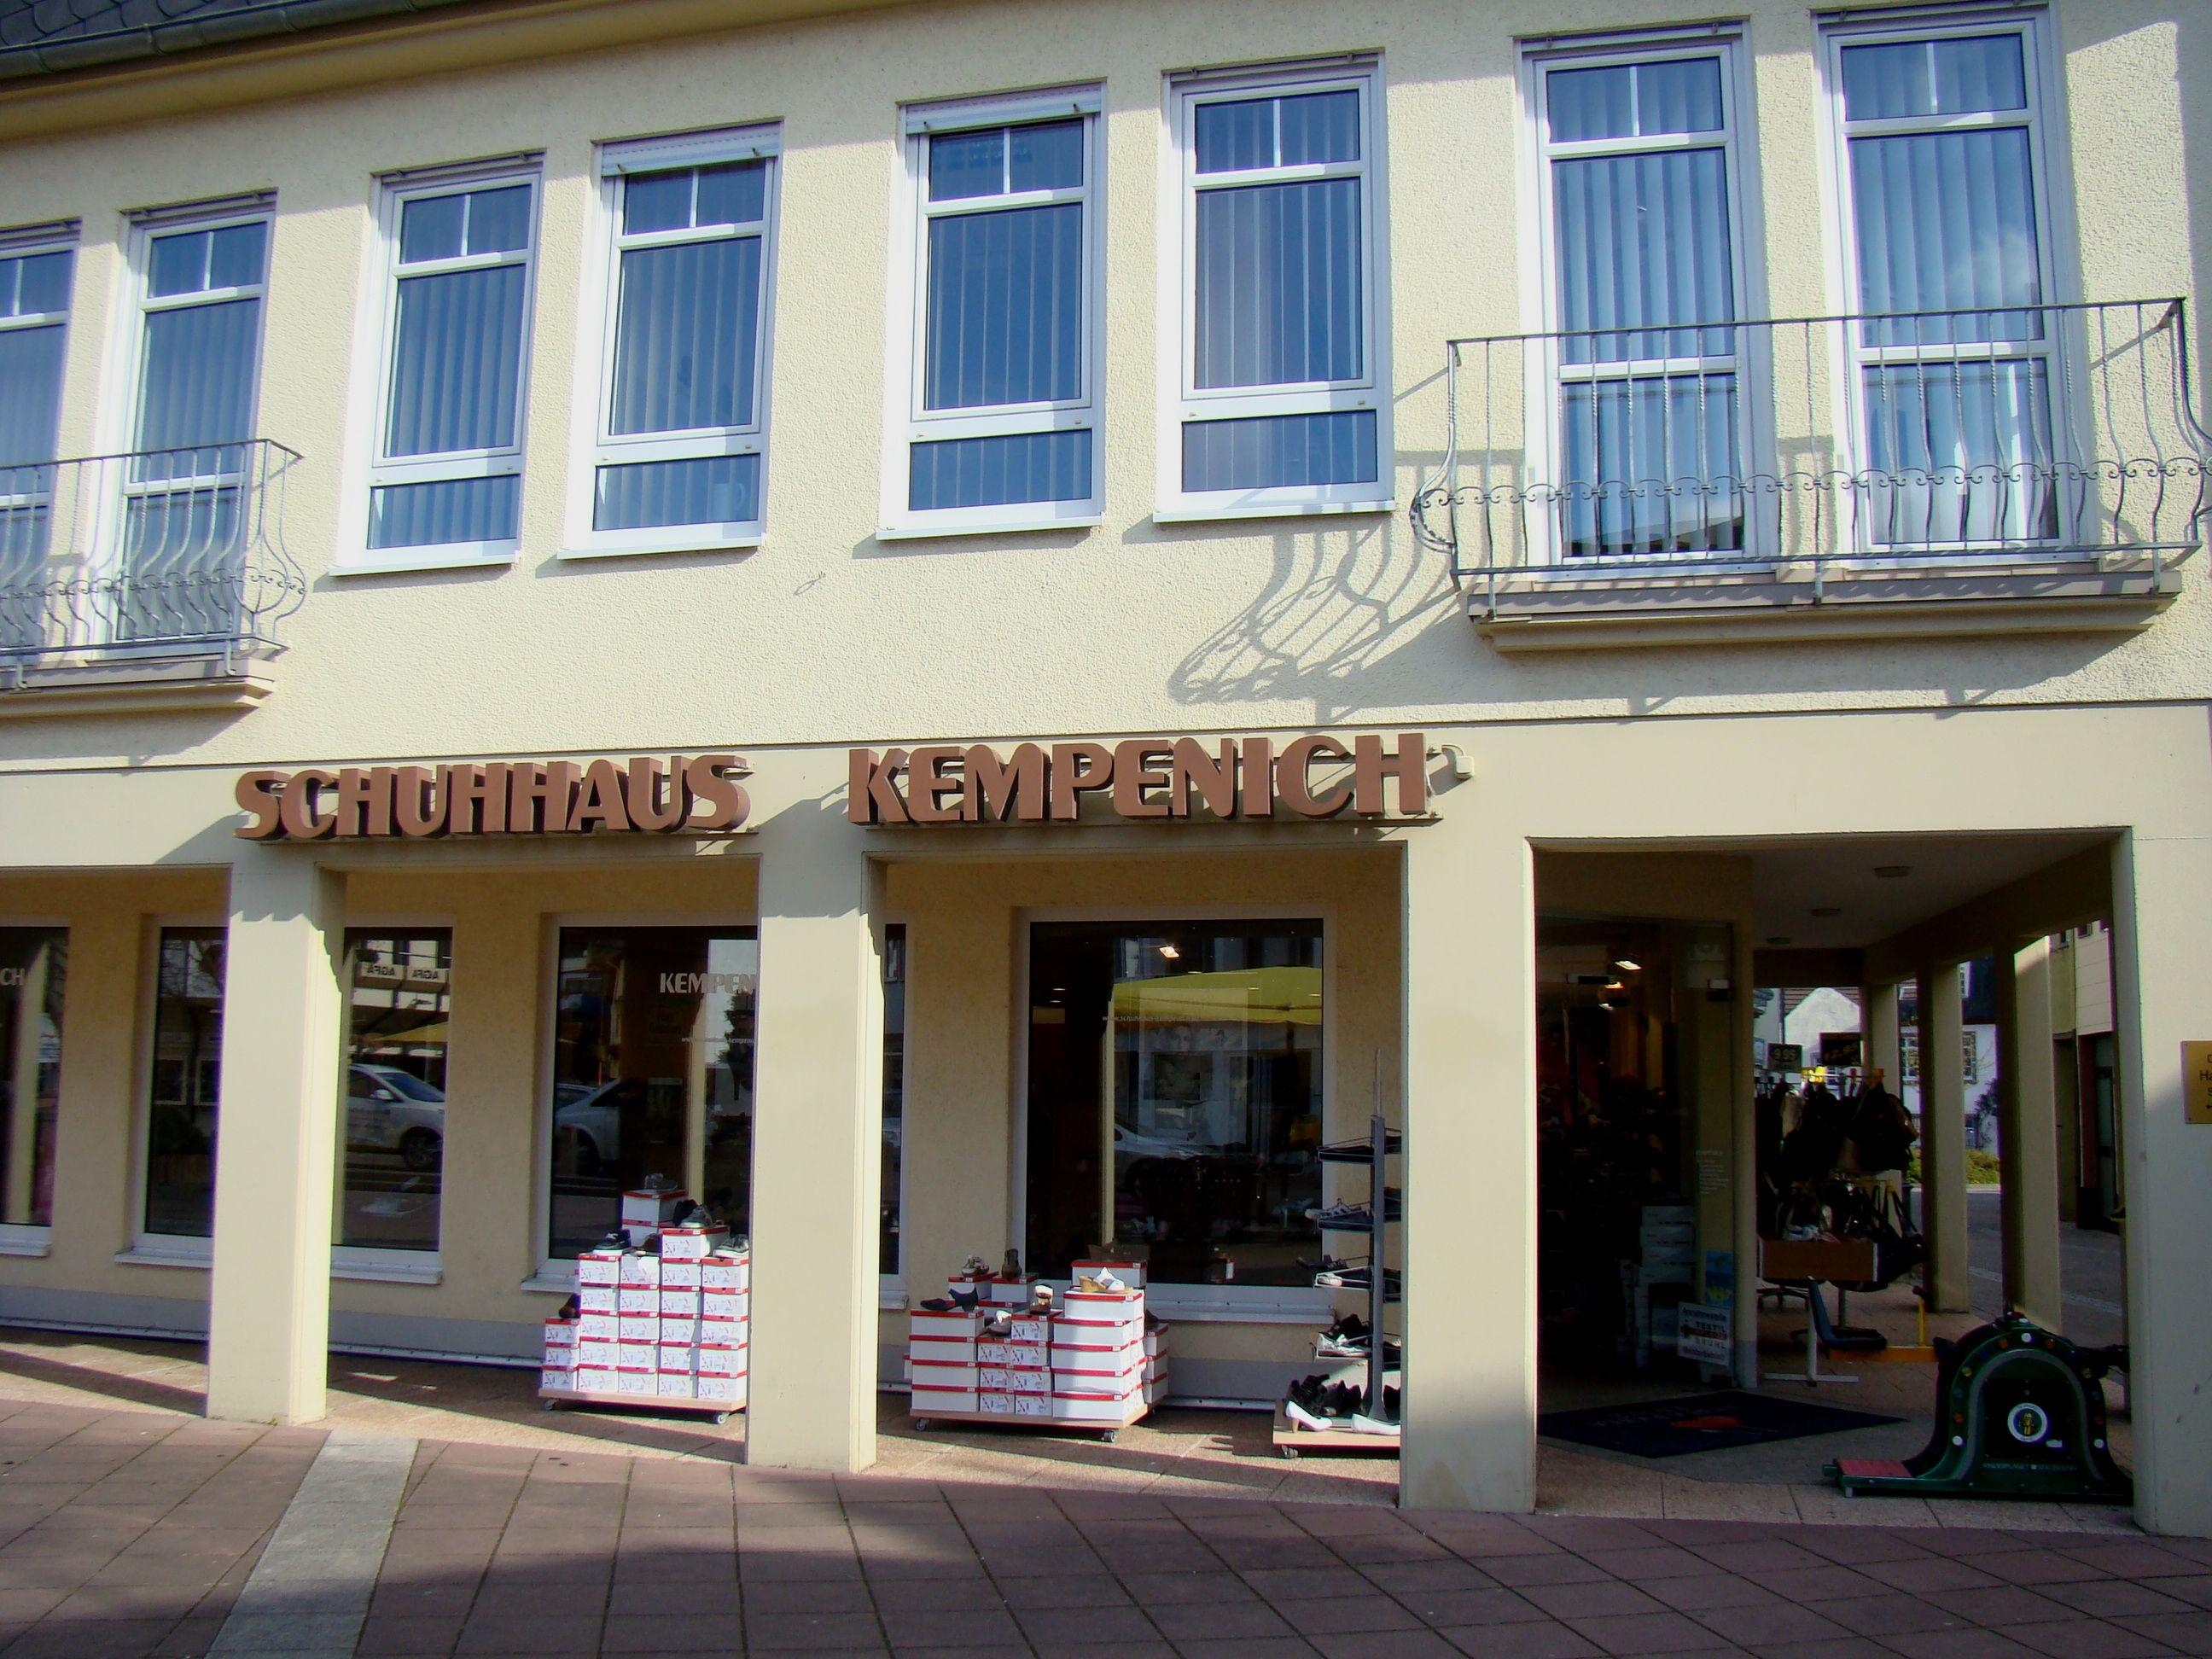 Schuhhaus Kempenich